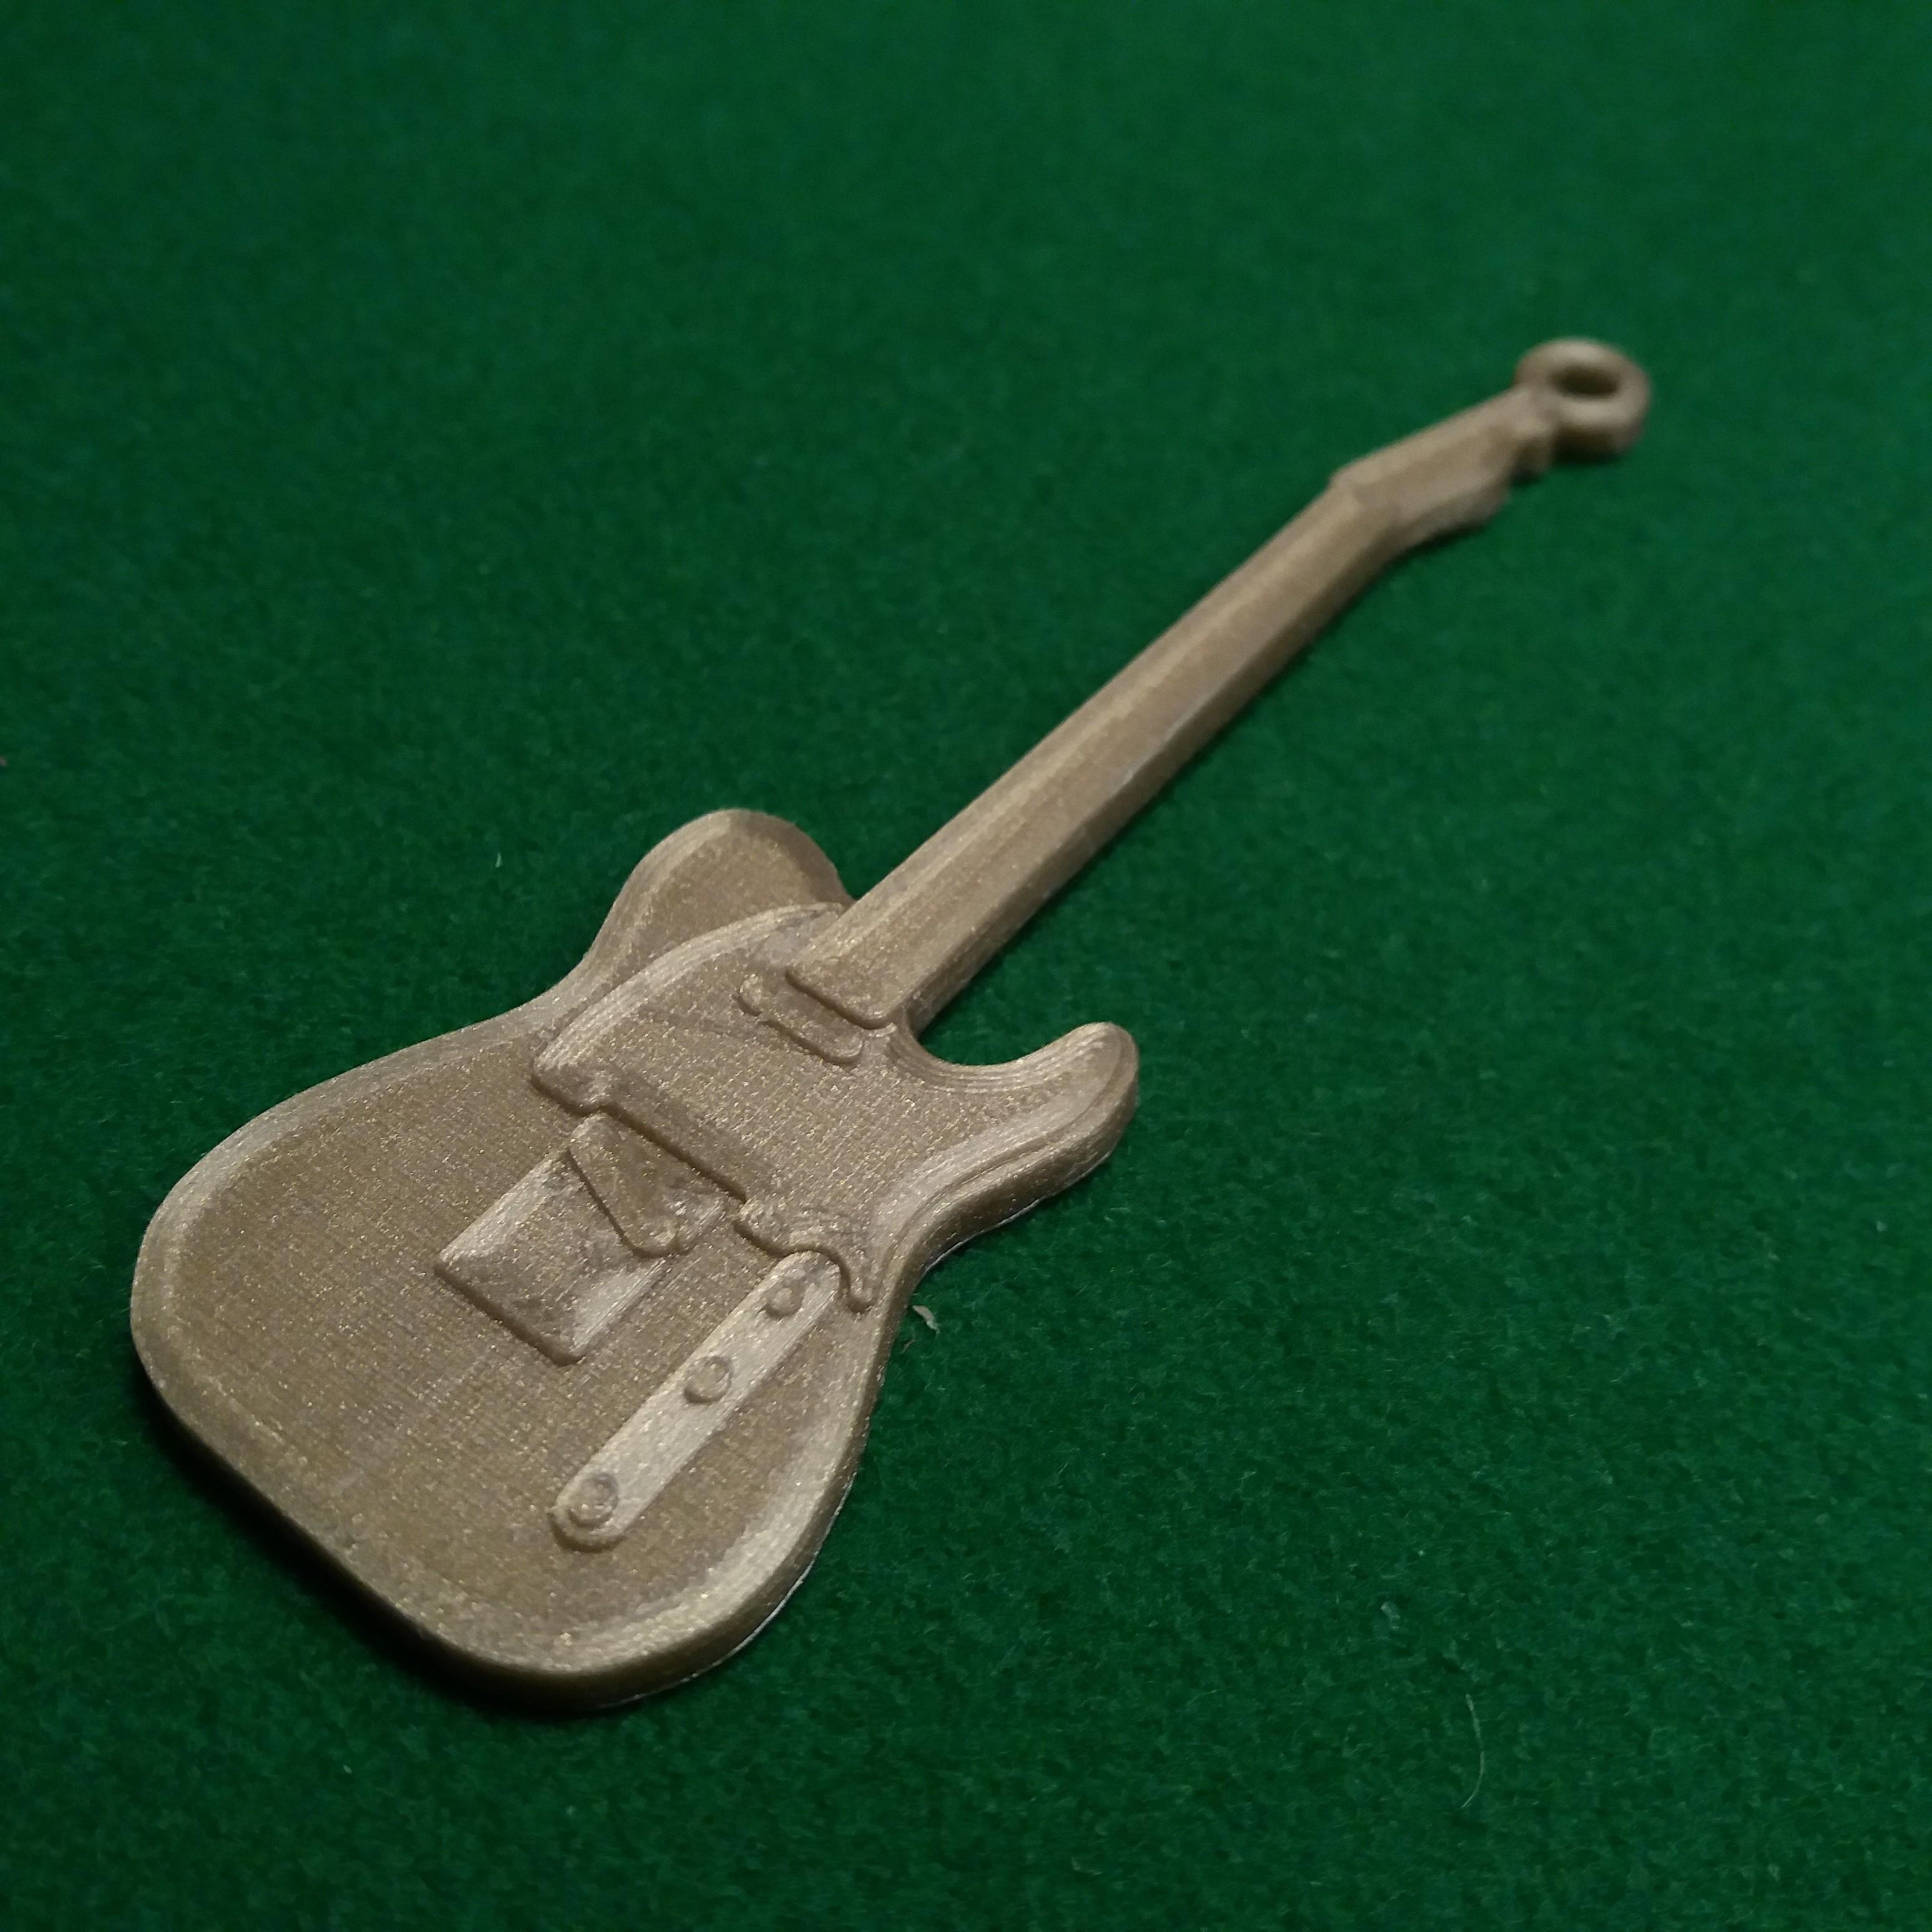 Fender telecaster.jpg Download free STL file Fender Telecaster Guitar • 3D printer object, gerbat